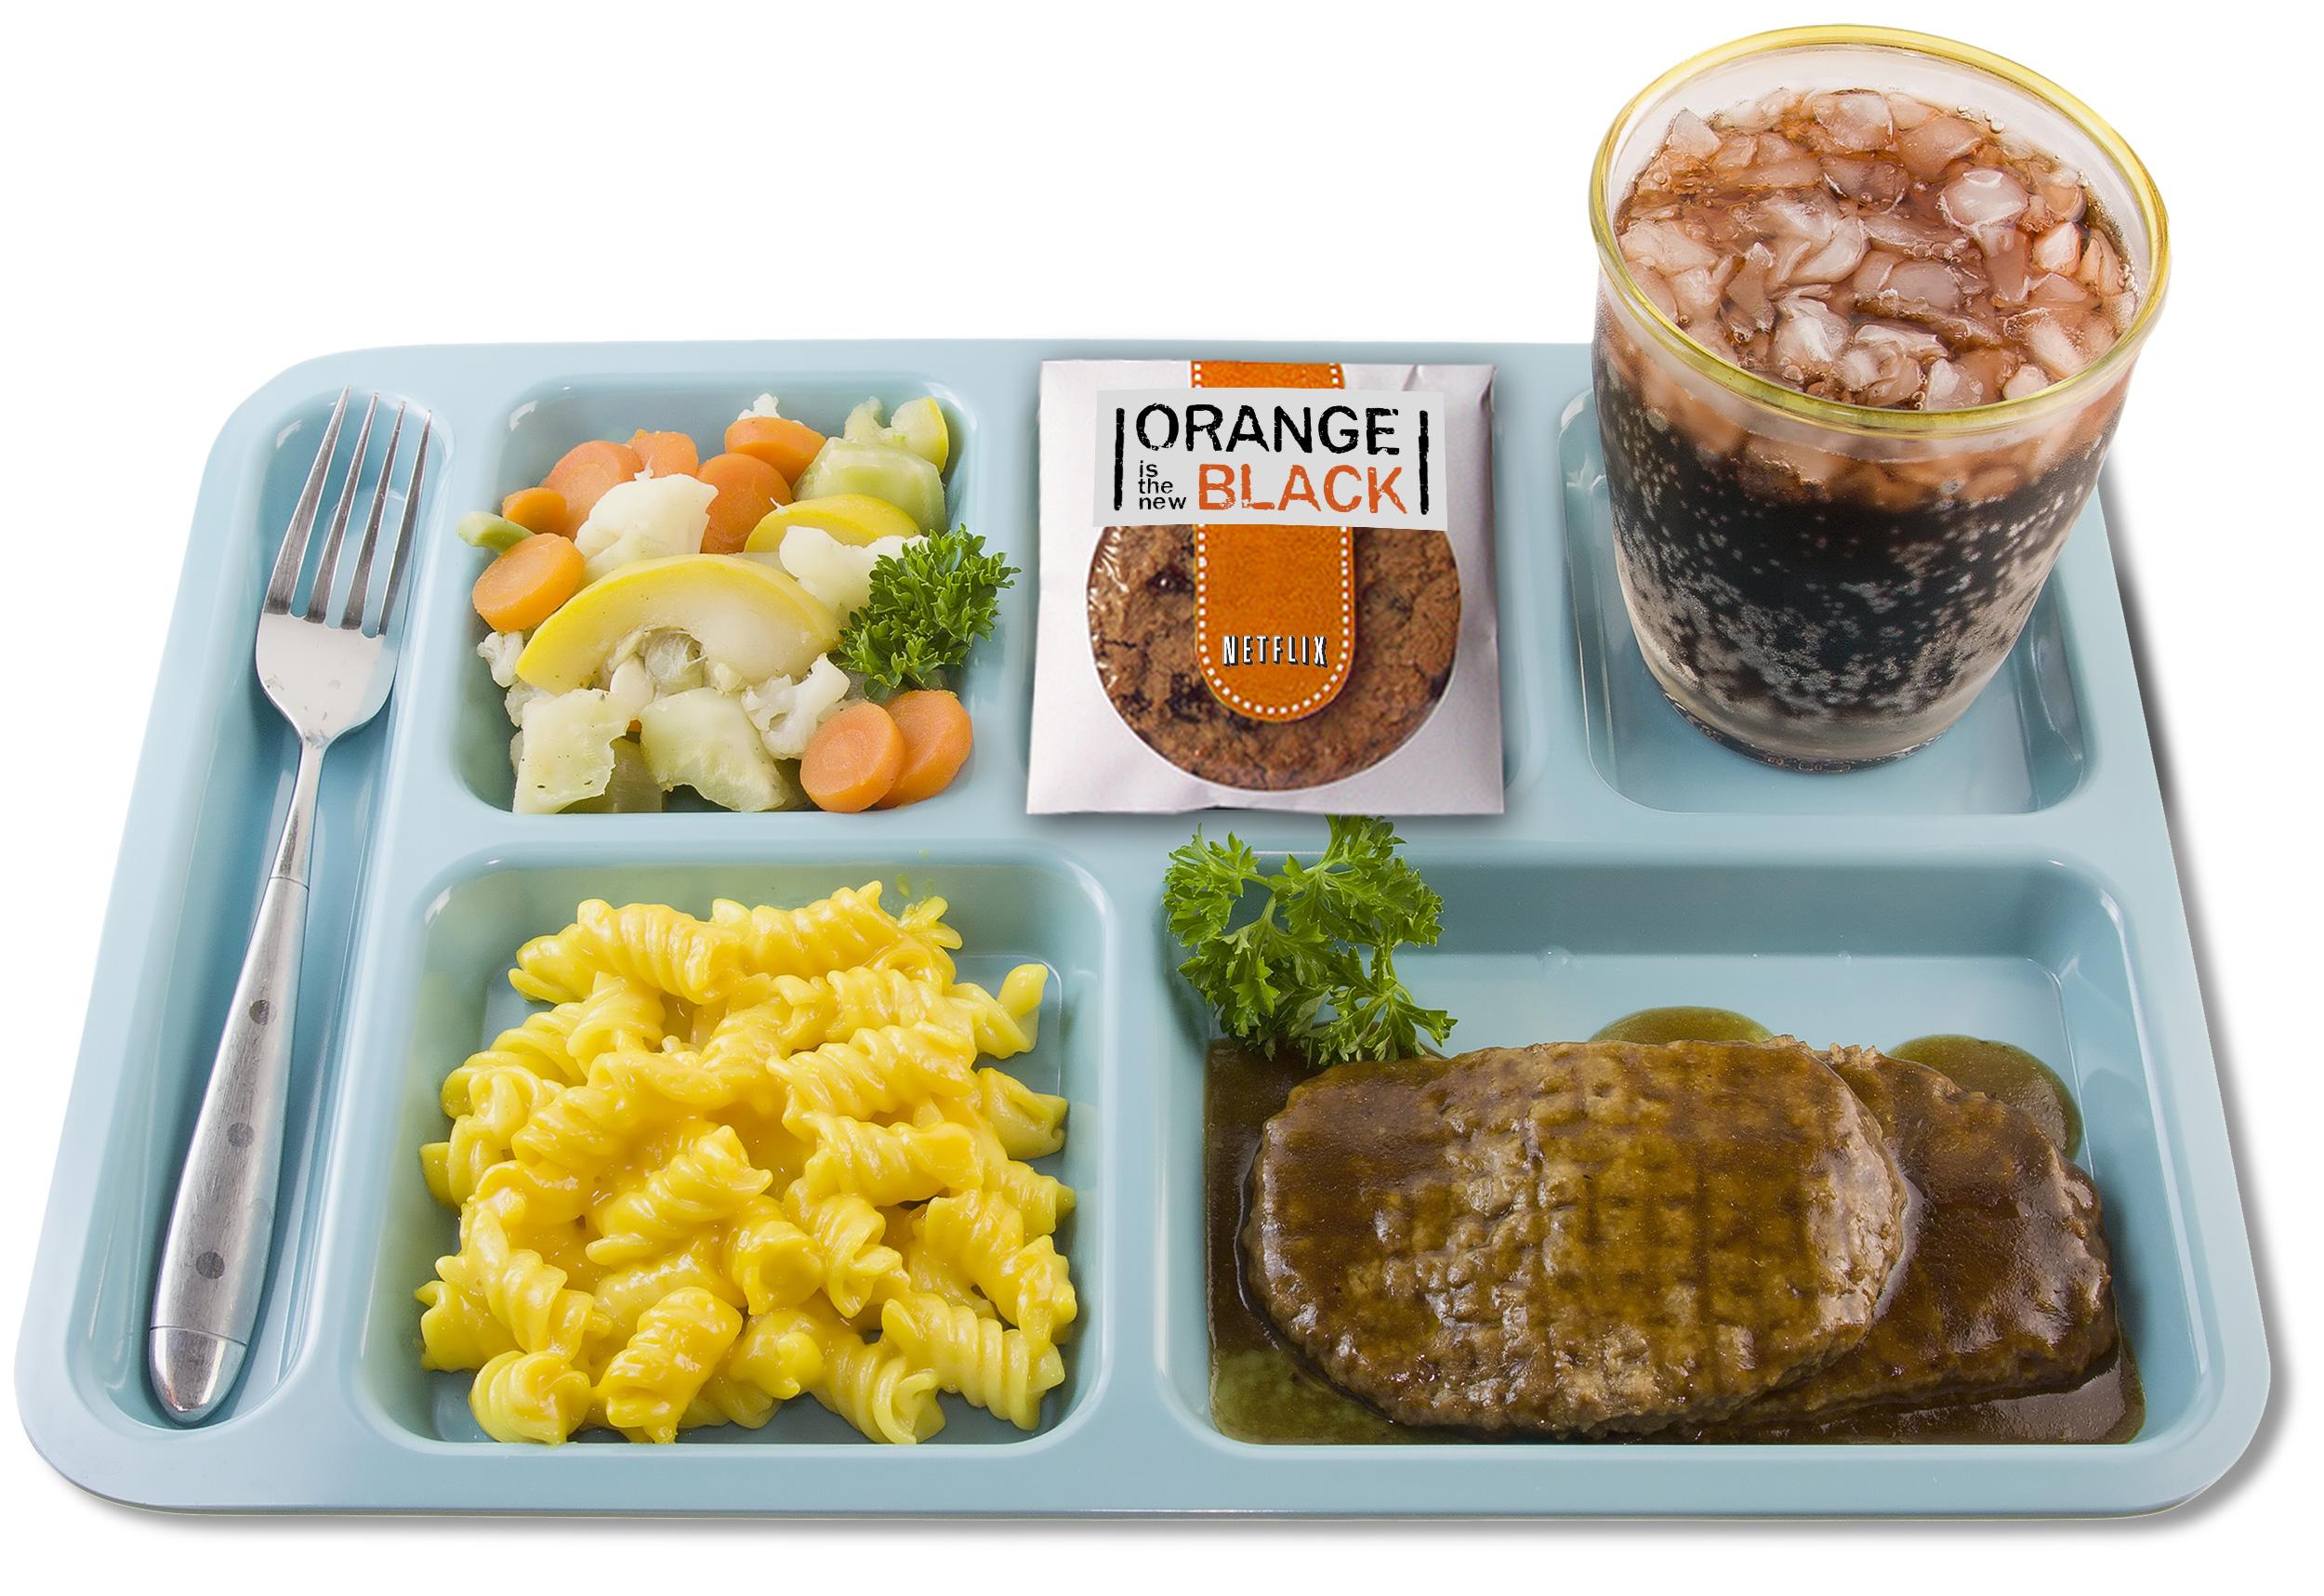 shutterstock_64266778-cafeteria-food-R.jpg